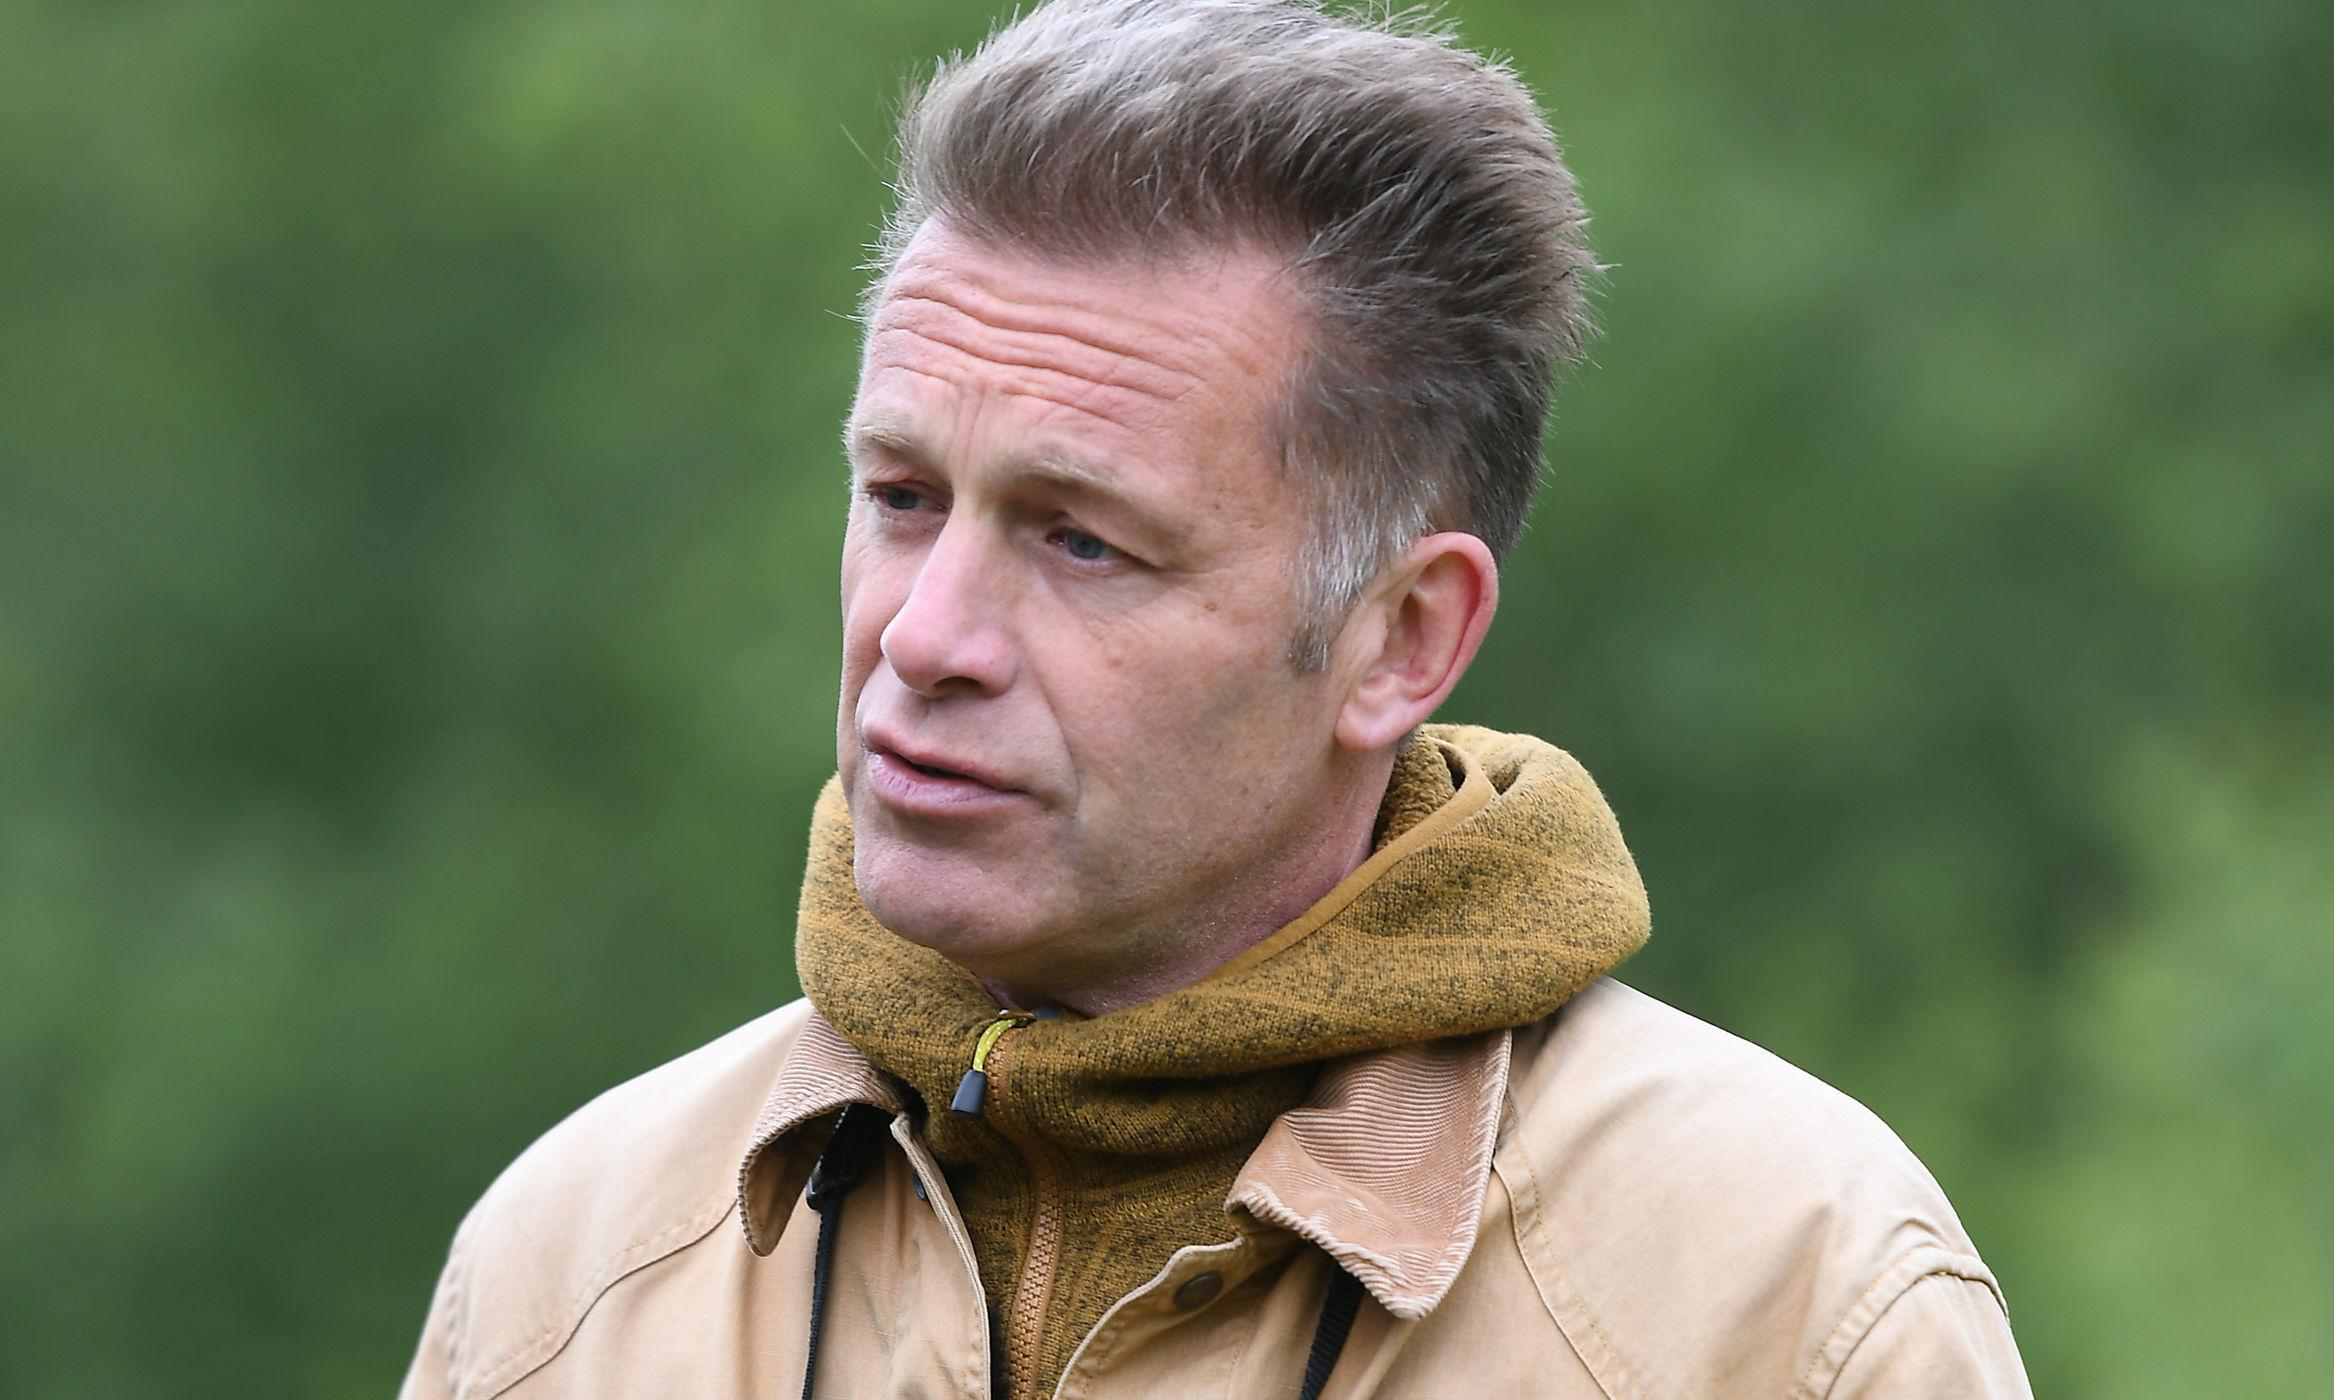 Chris Packham urges TV makers to shout louder about nature crises